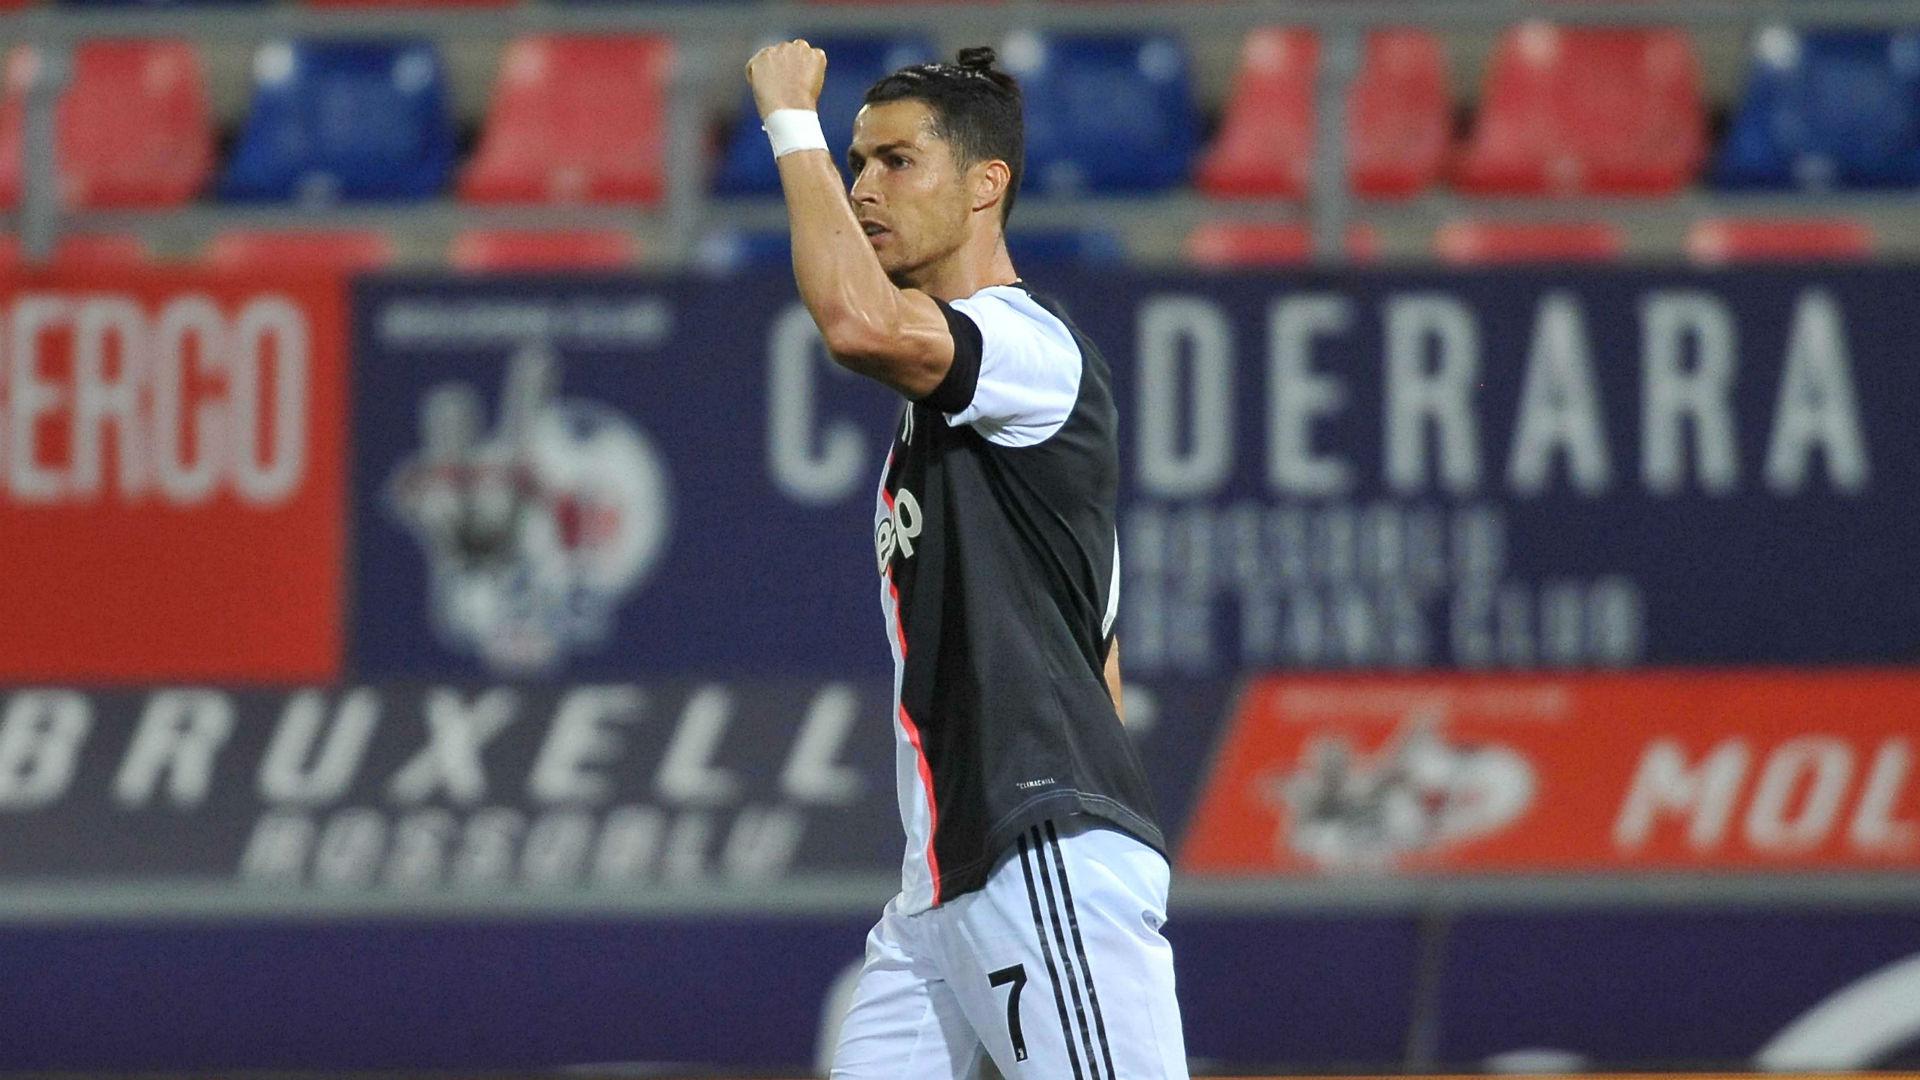 Bologna 0-2 Juventus: Ronaldo scores as normal service resumes for champions